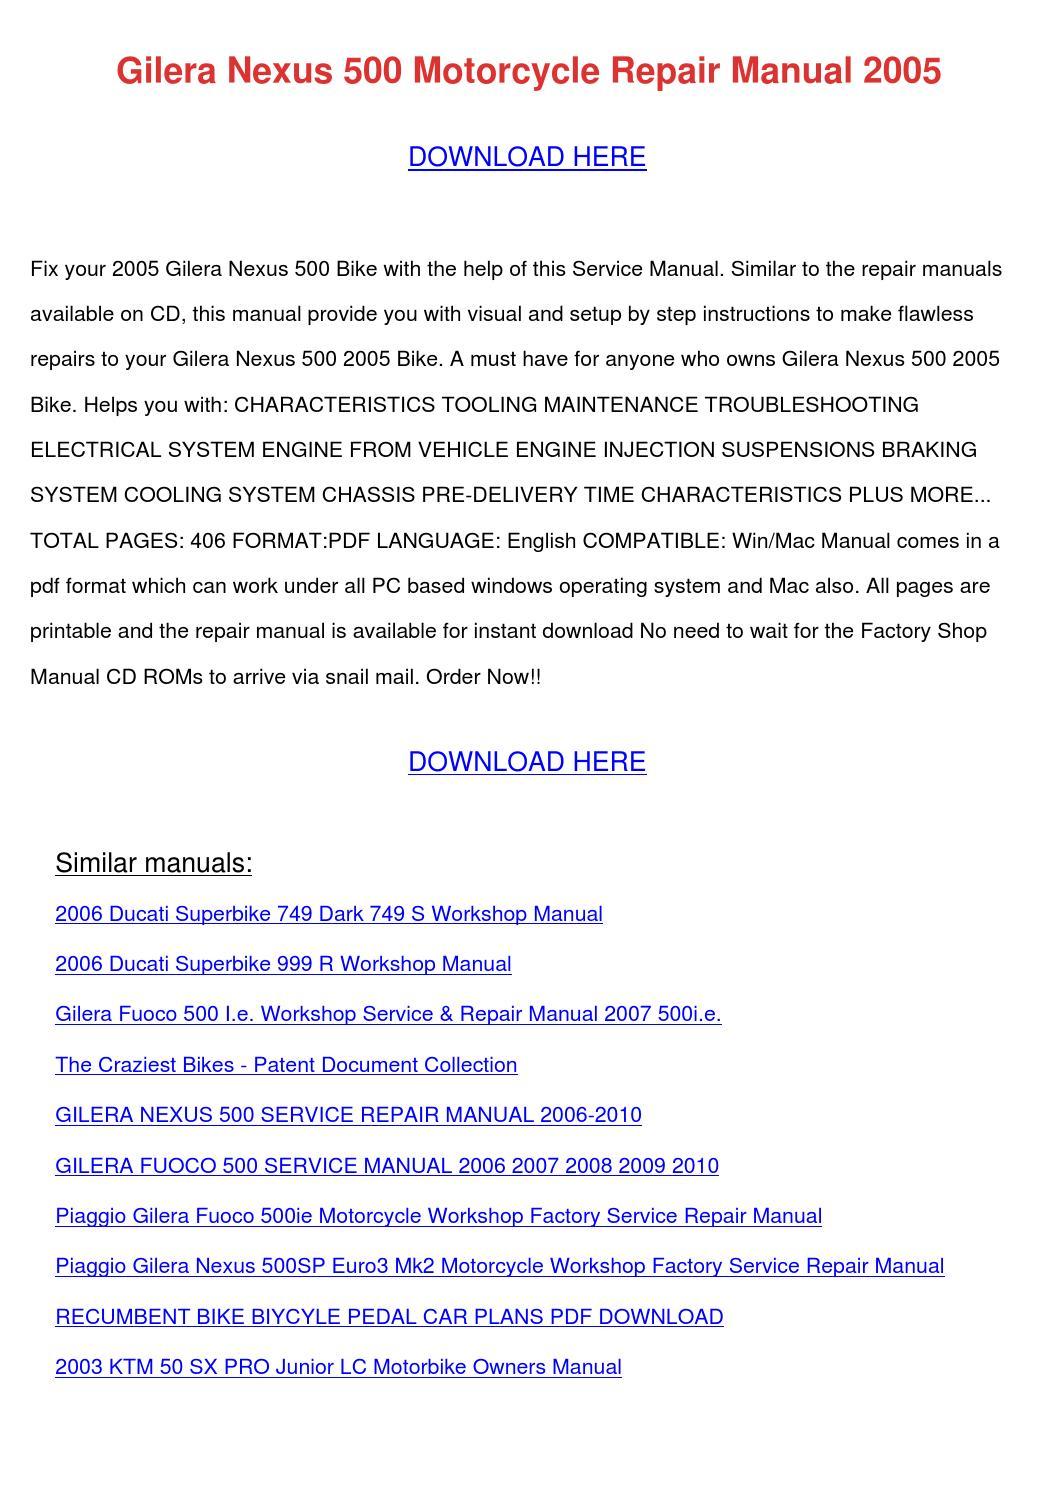 Gilera Nexus 500 Motorcycle Repair Manual 200 by SeymourSaldivar ...